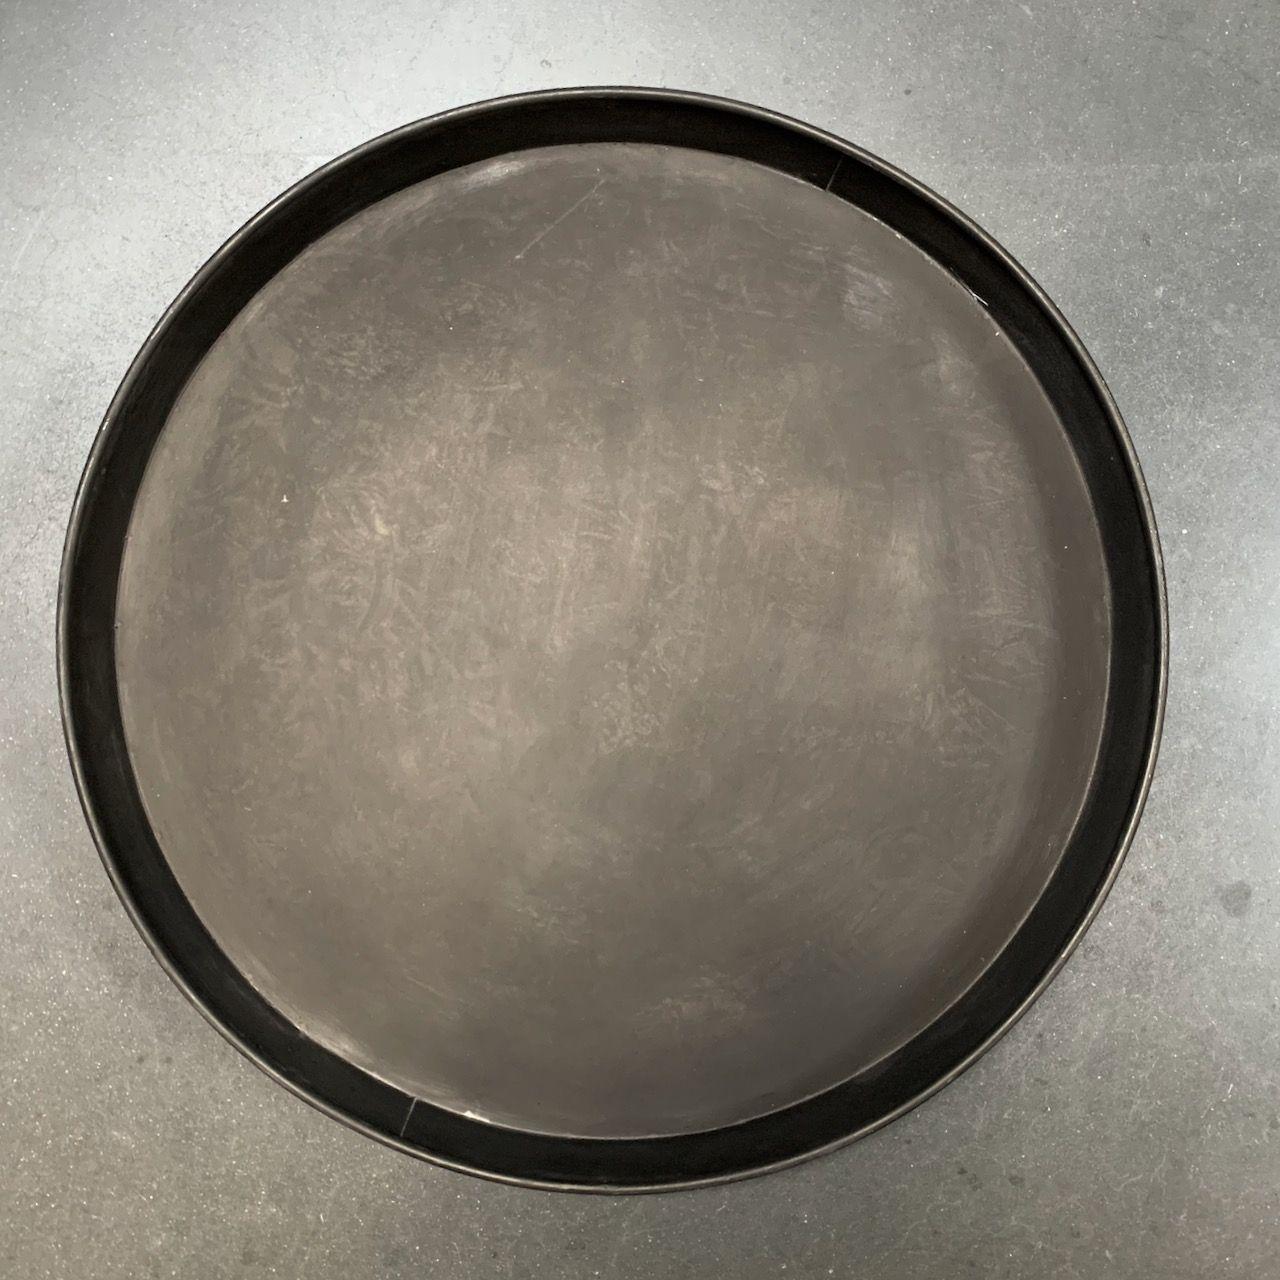 Zwart Dienblad XL - in Dienbladen